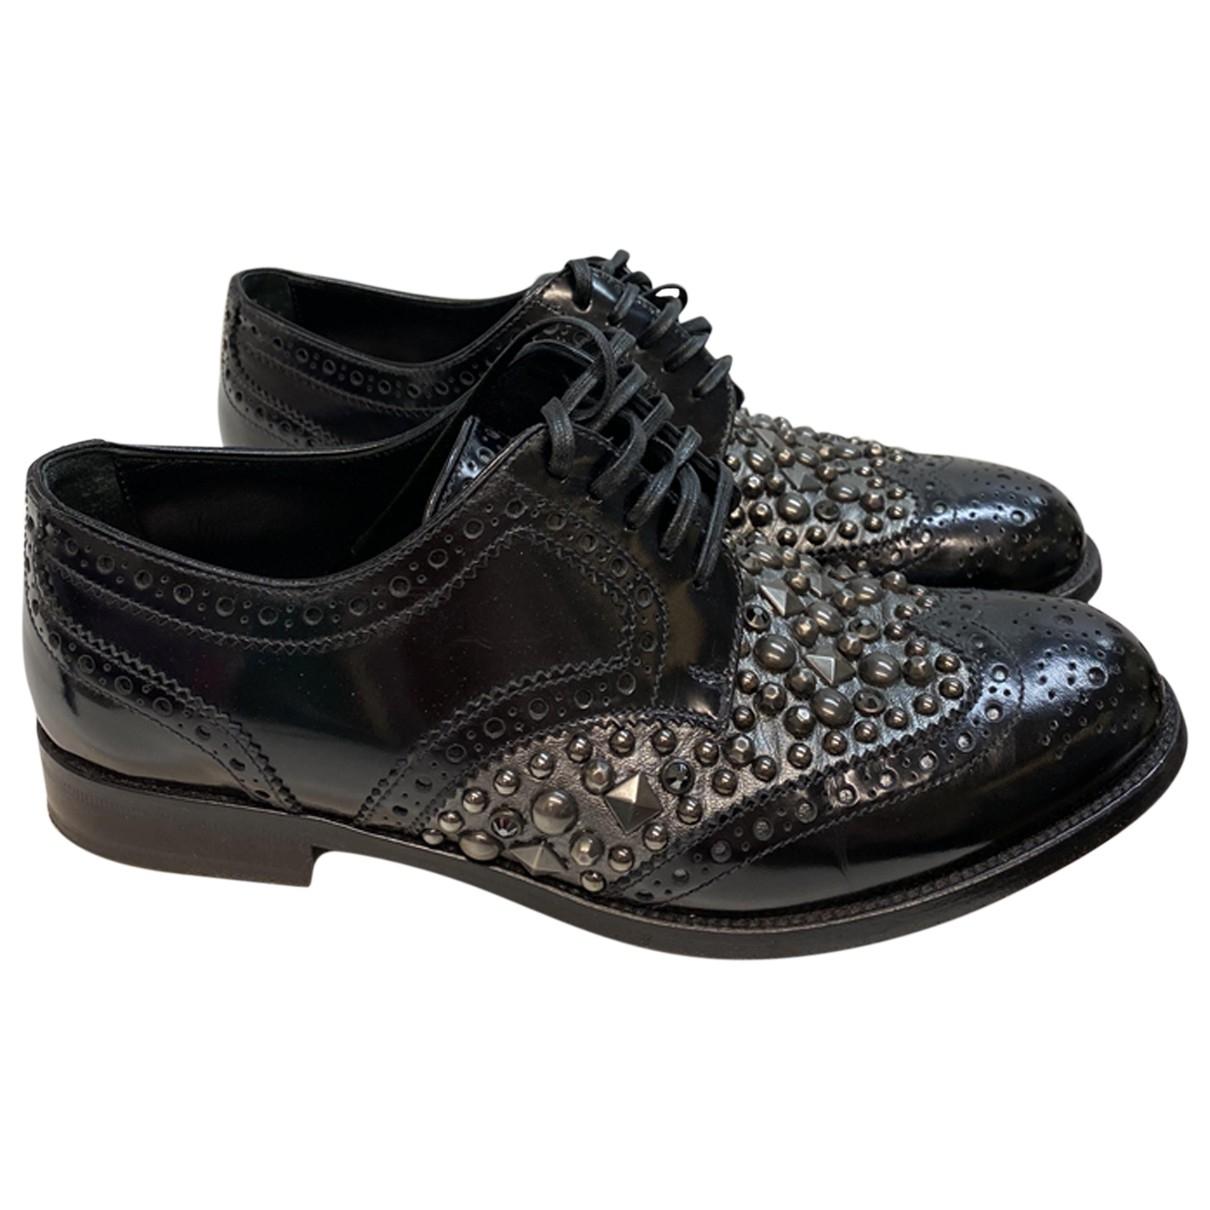 Dolce & Gabbana \N Black Leather Lace ups for Women 37 EU